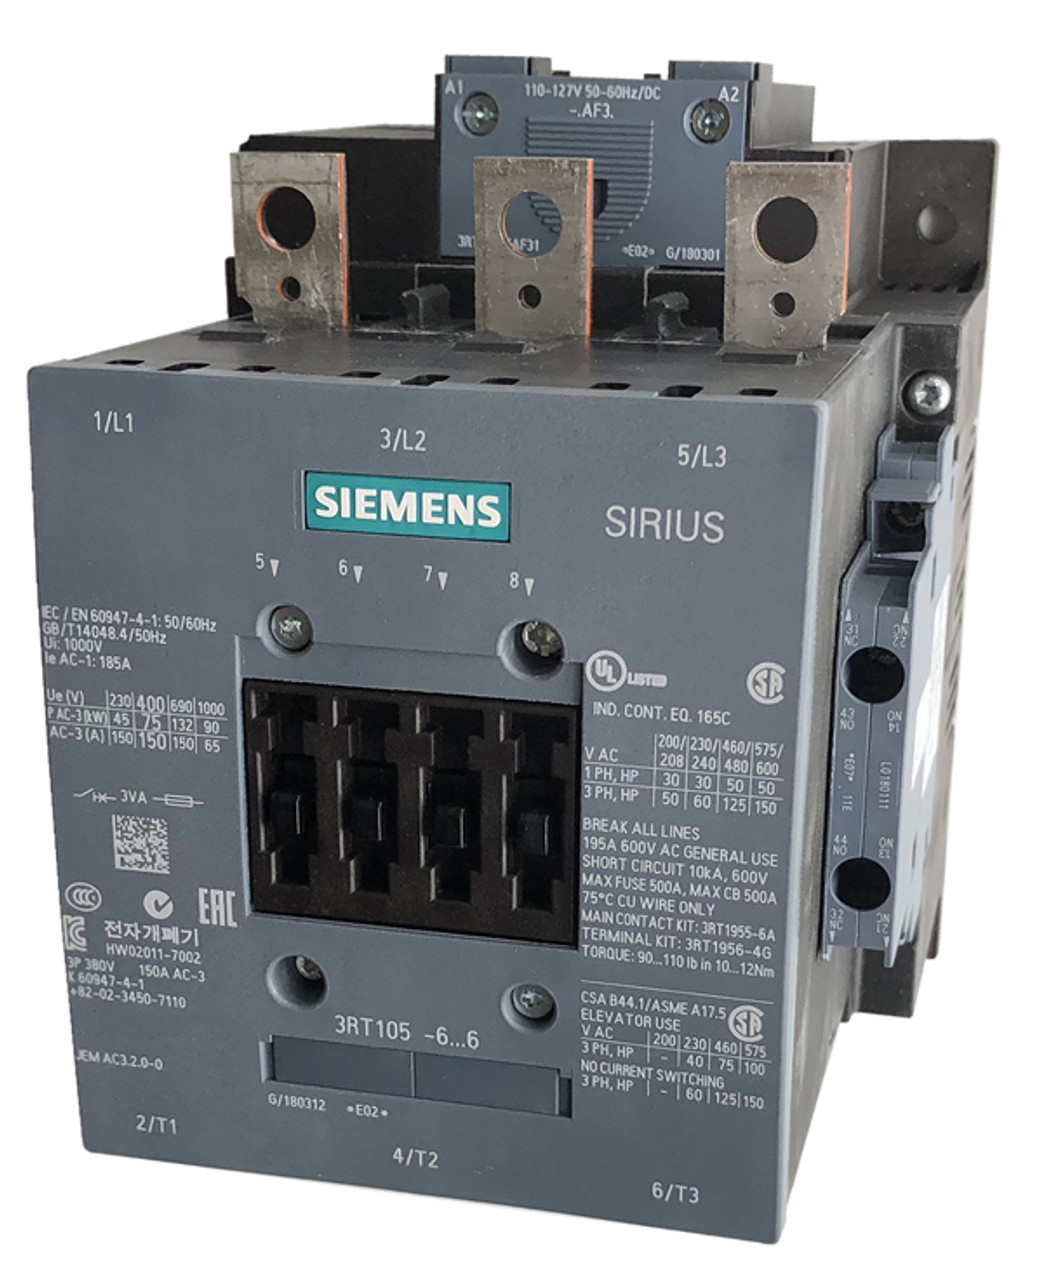 Conventional Coil Screw Terminals Siemens 3RT10 56-6AB36-0UA0 NEMA Motor Contactor NEMA Size 4 DC 23-26V 3RT10566AB360UA0 135 Amp Rating 3 Poles 2 NC Auxiliary Contacts AC 40-60Hz 2 NO